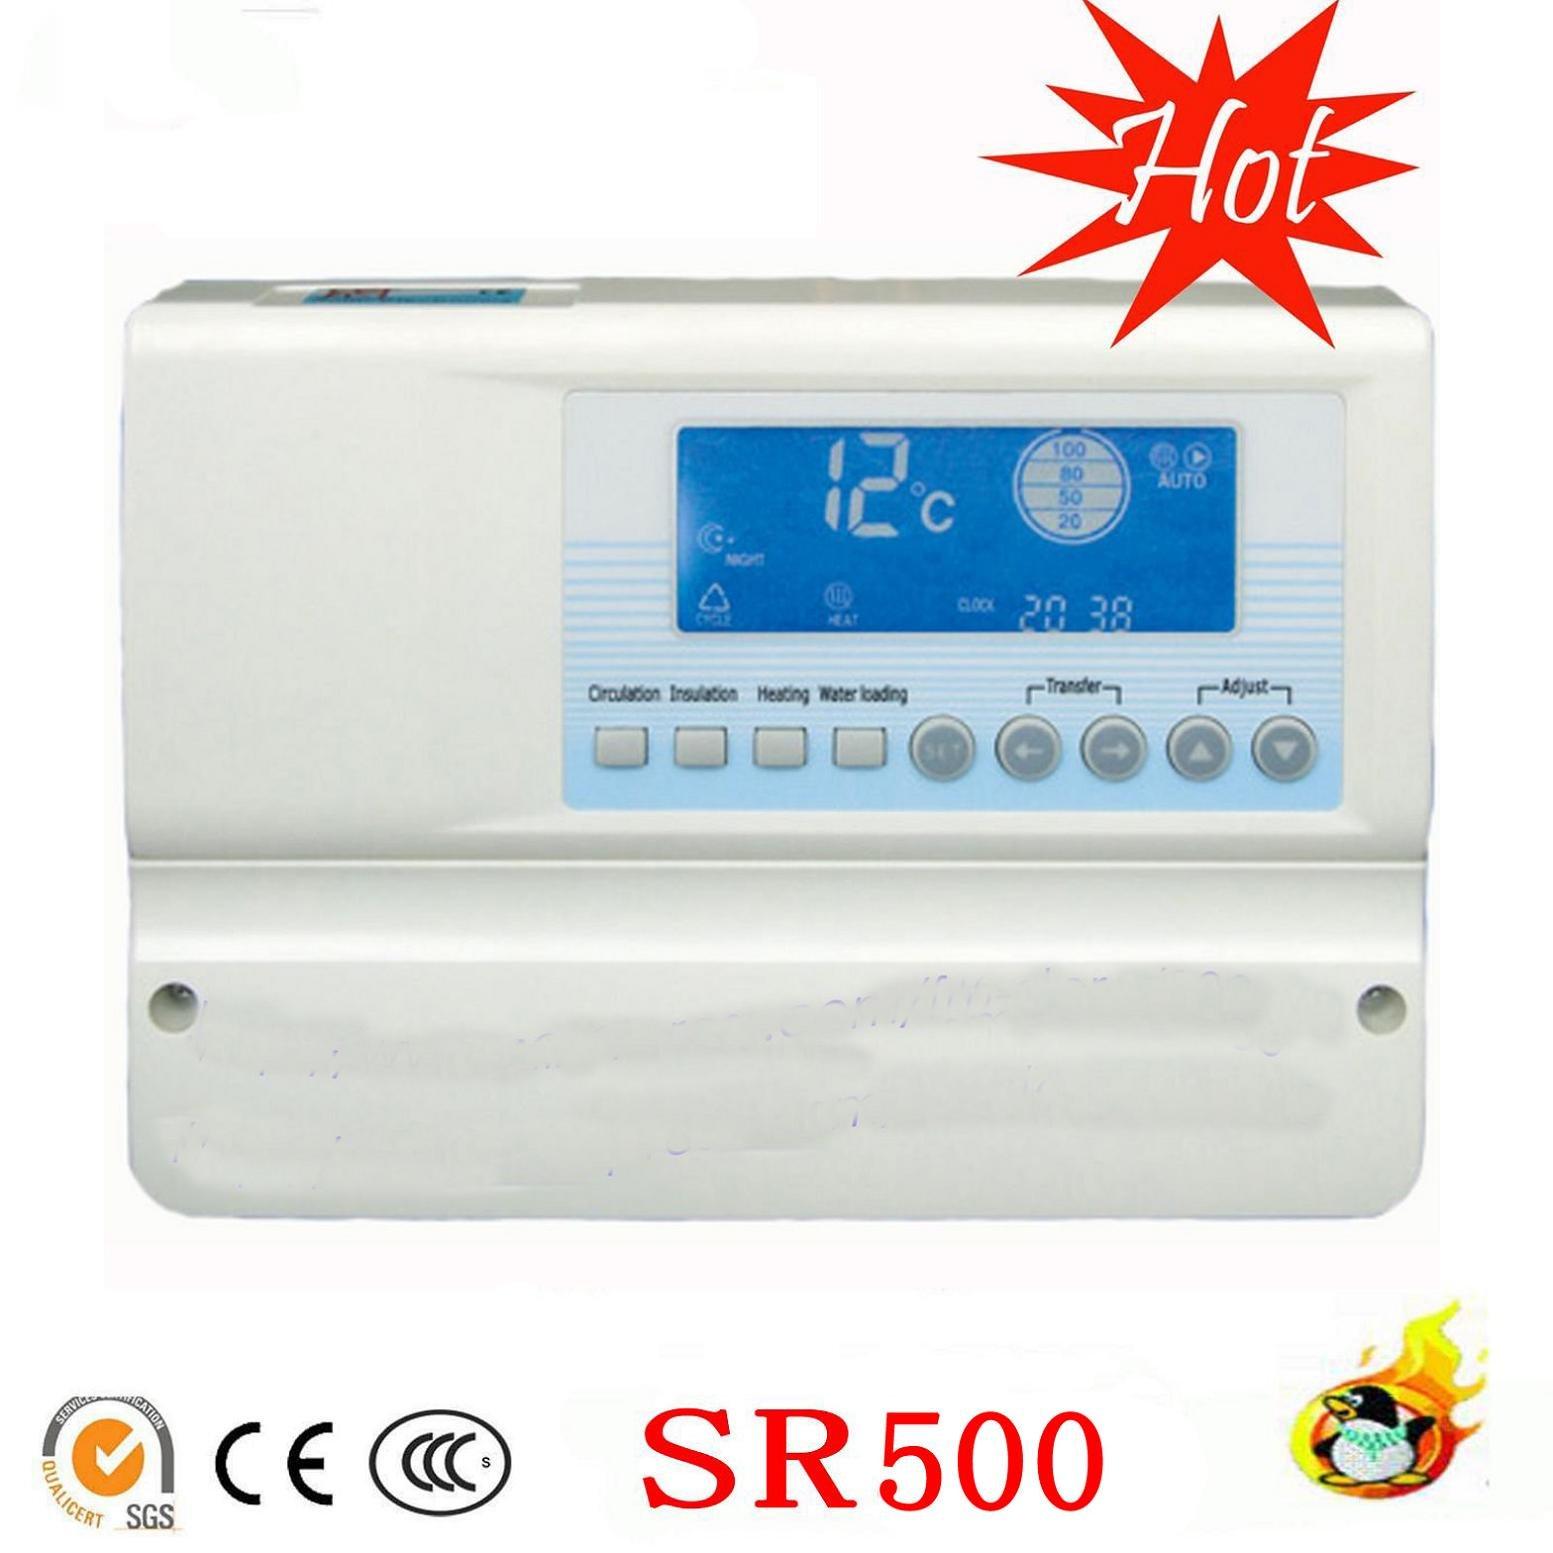 controller solar water heater controler temperature controller  #C31508